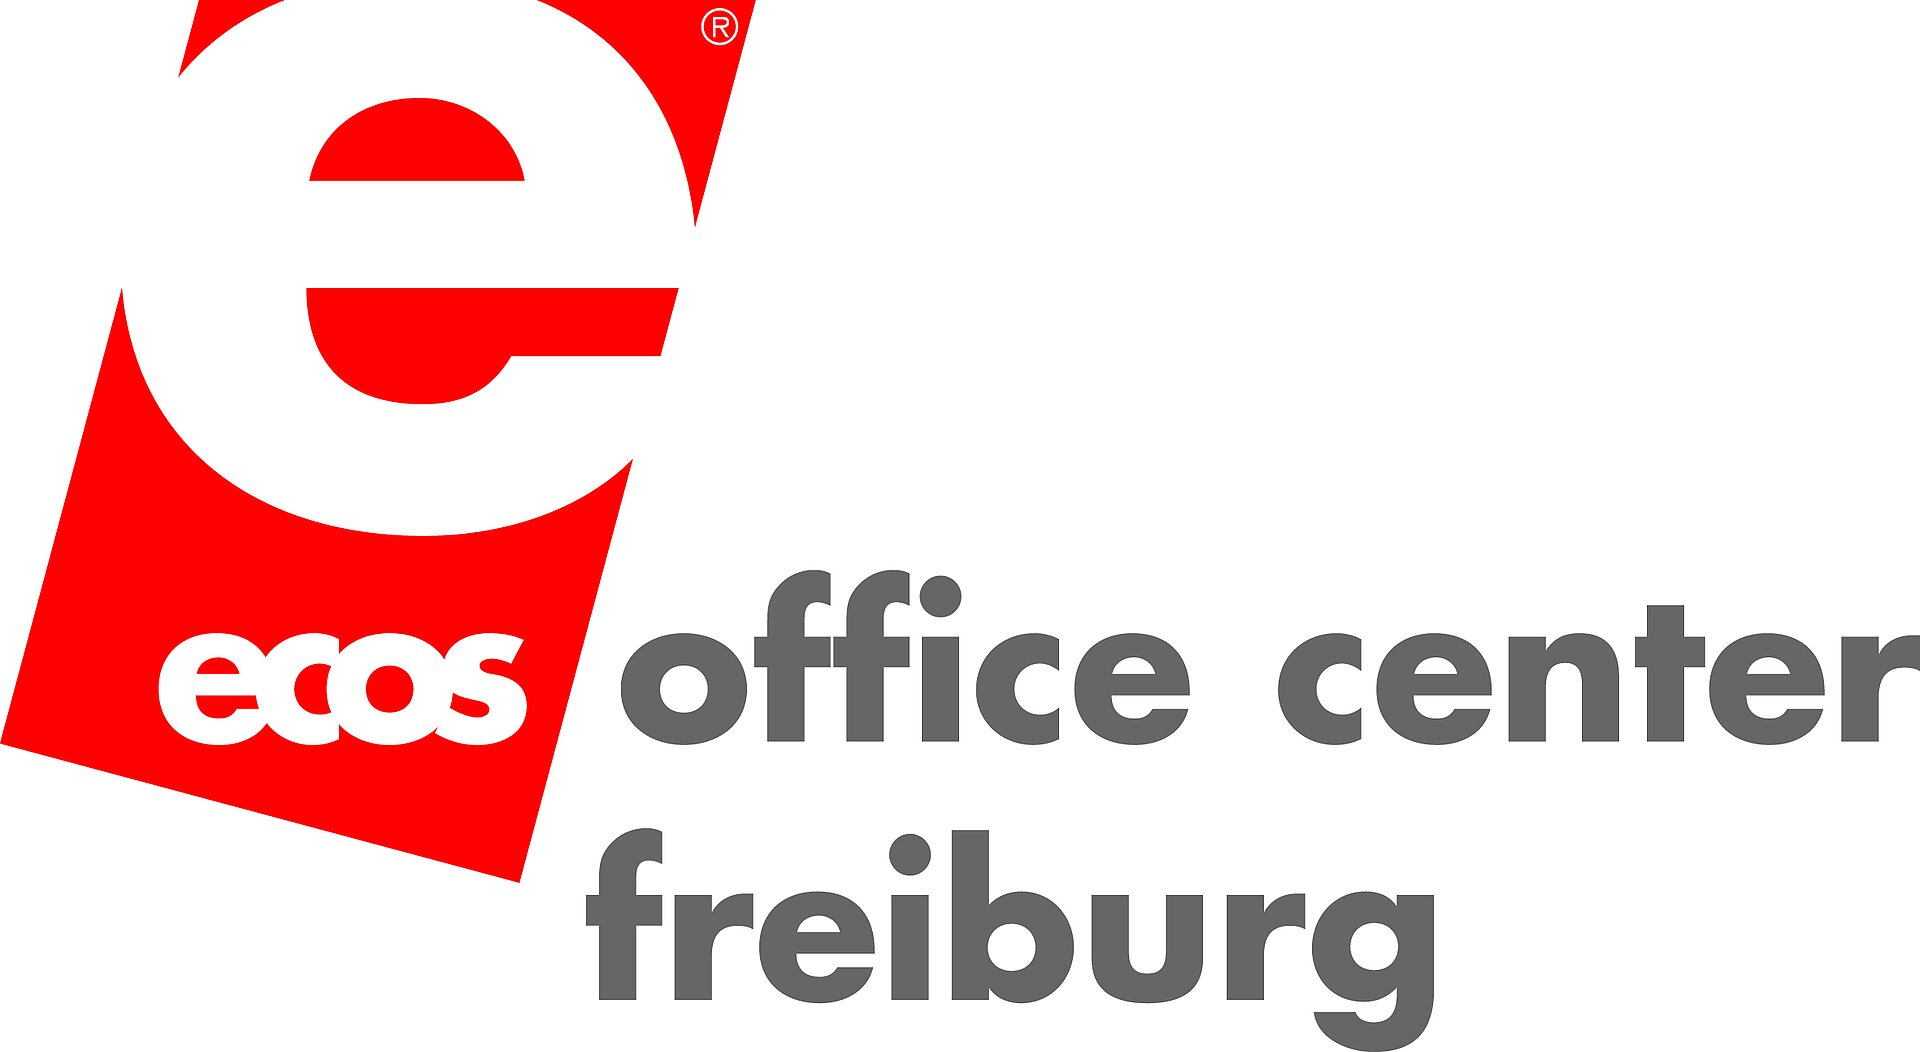 Logo des ecos office center freiburg